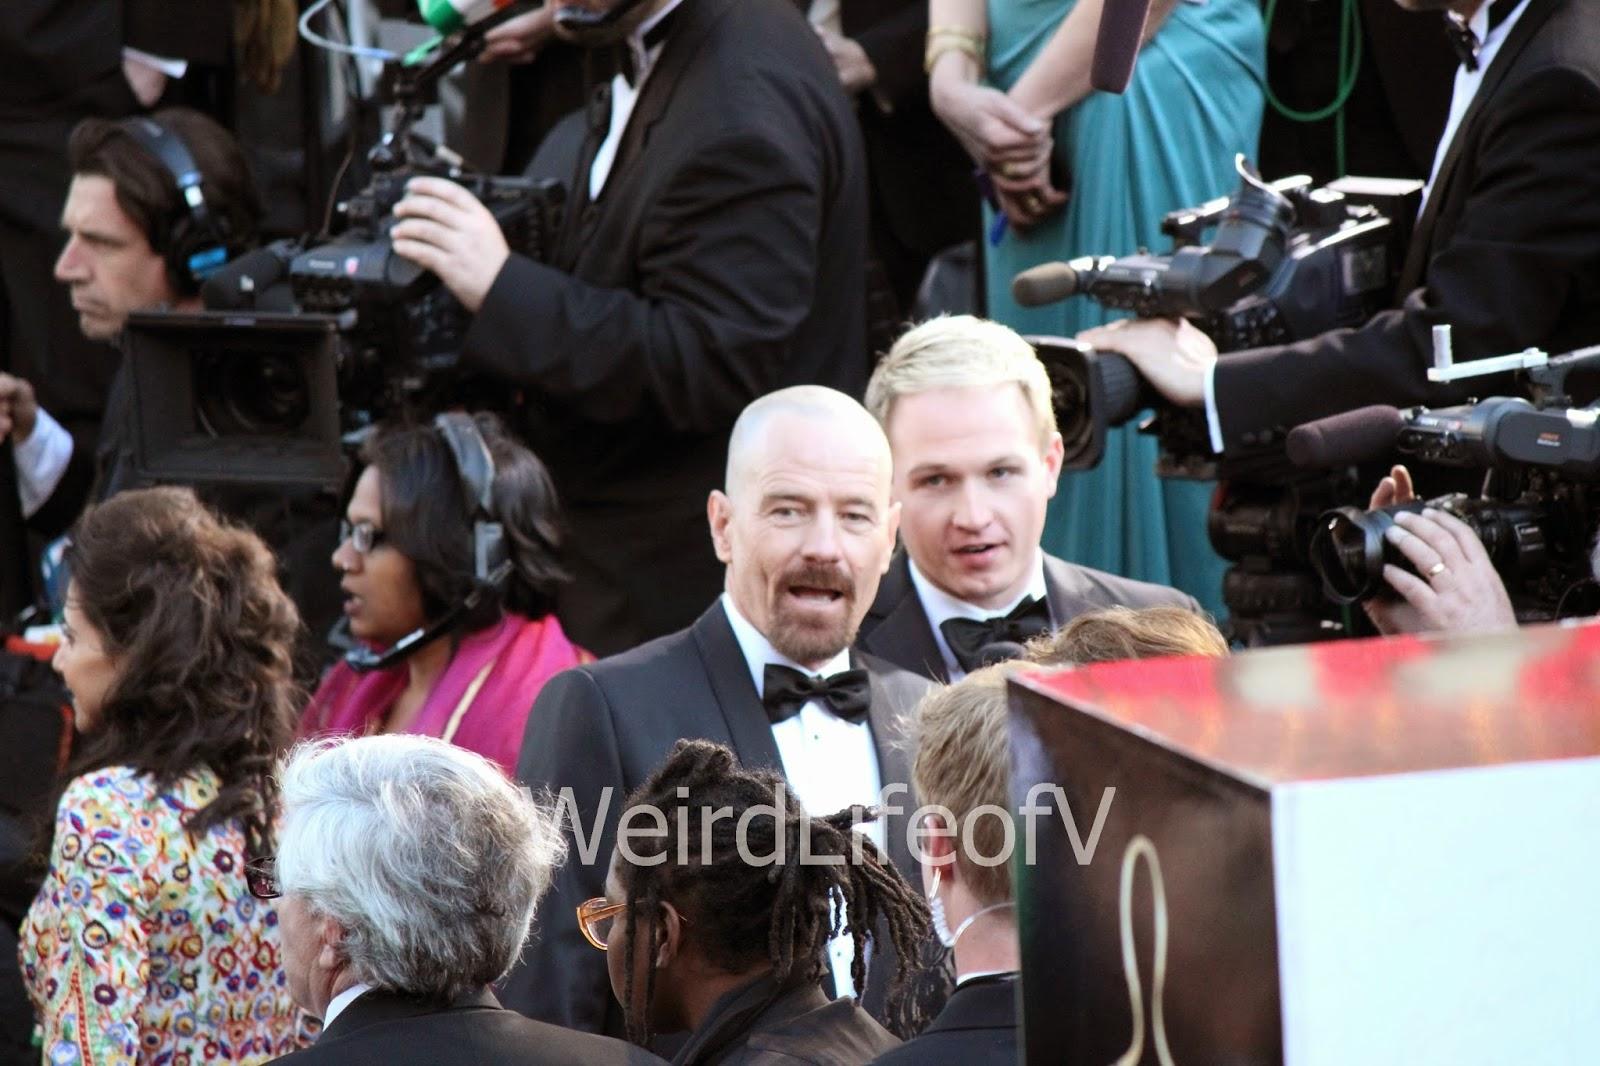 Bryan Cranston on the Oscars 2013 red carpet.